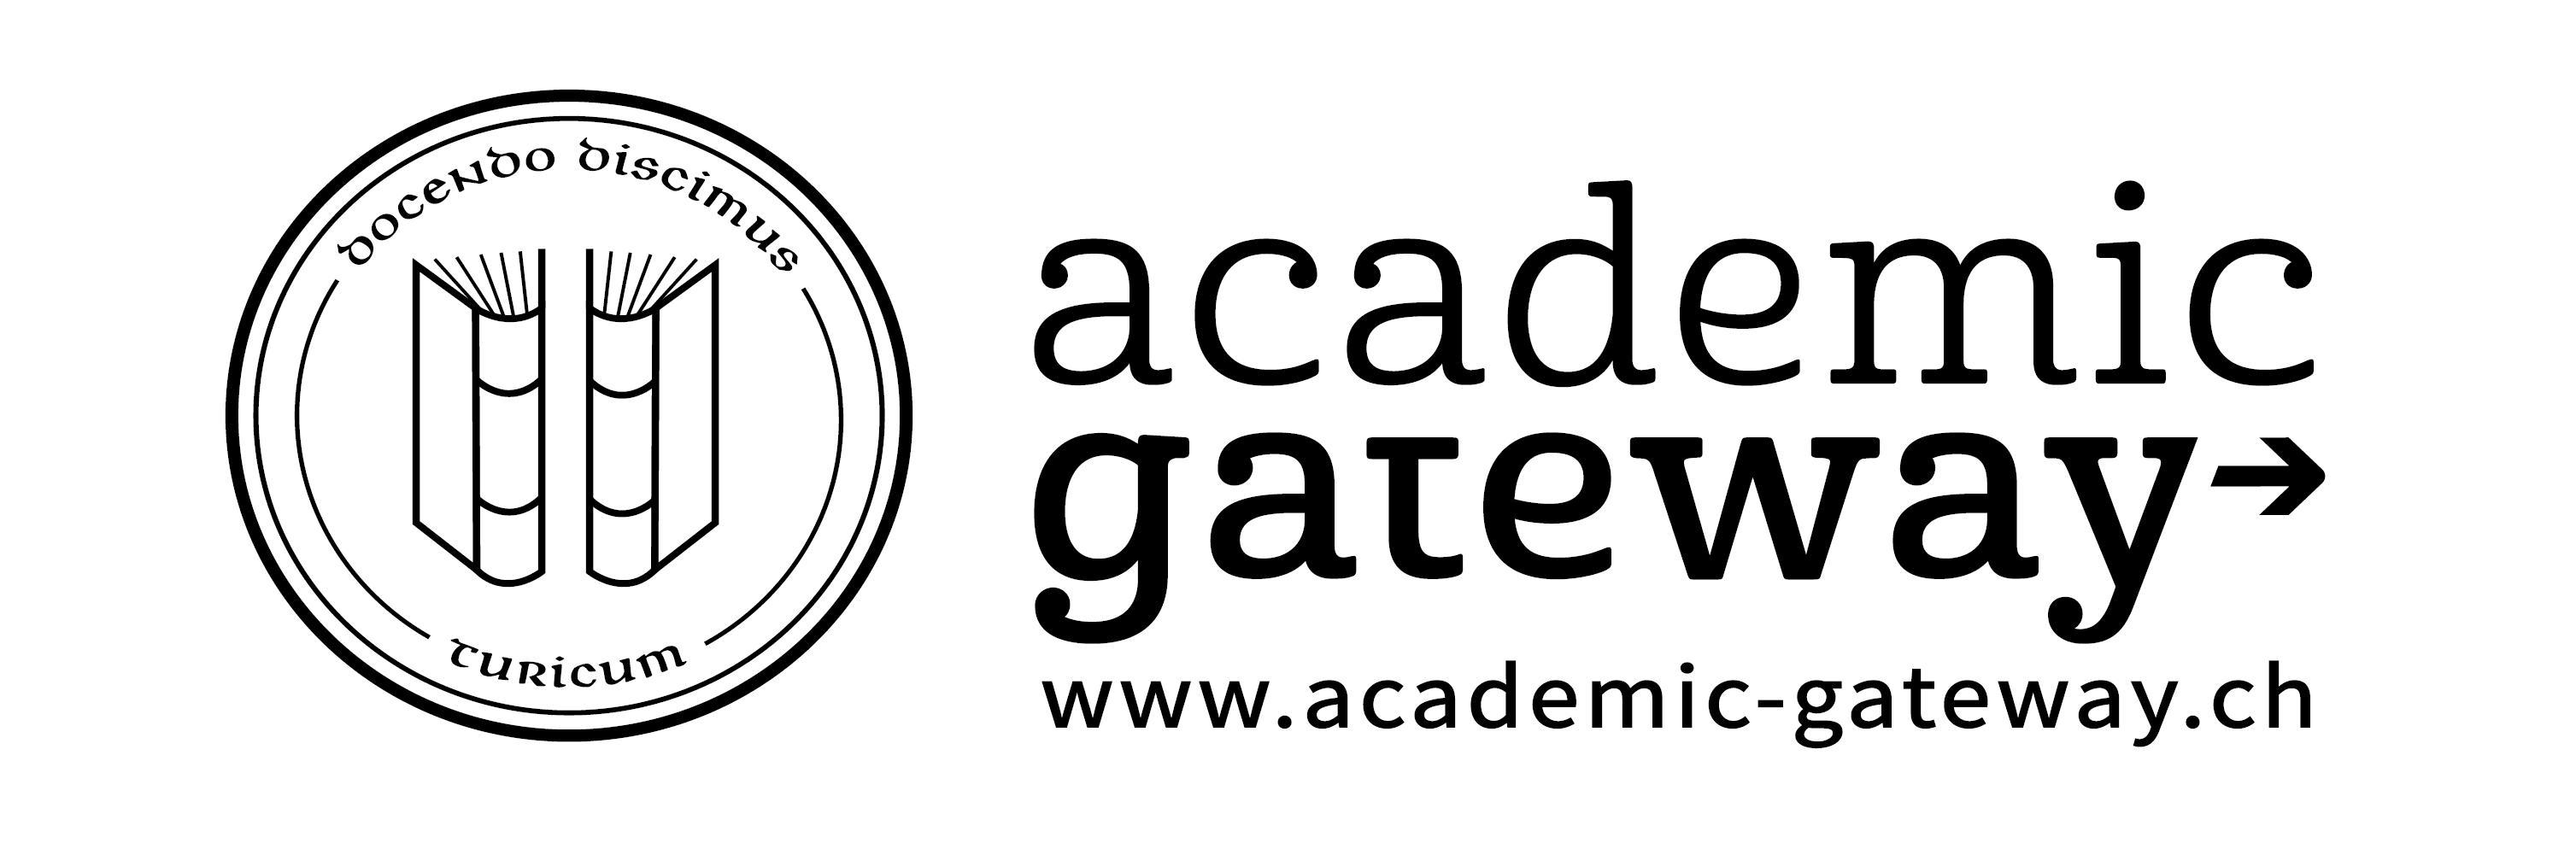 Academic Gateway